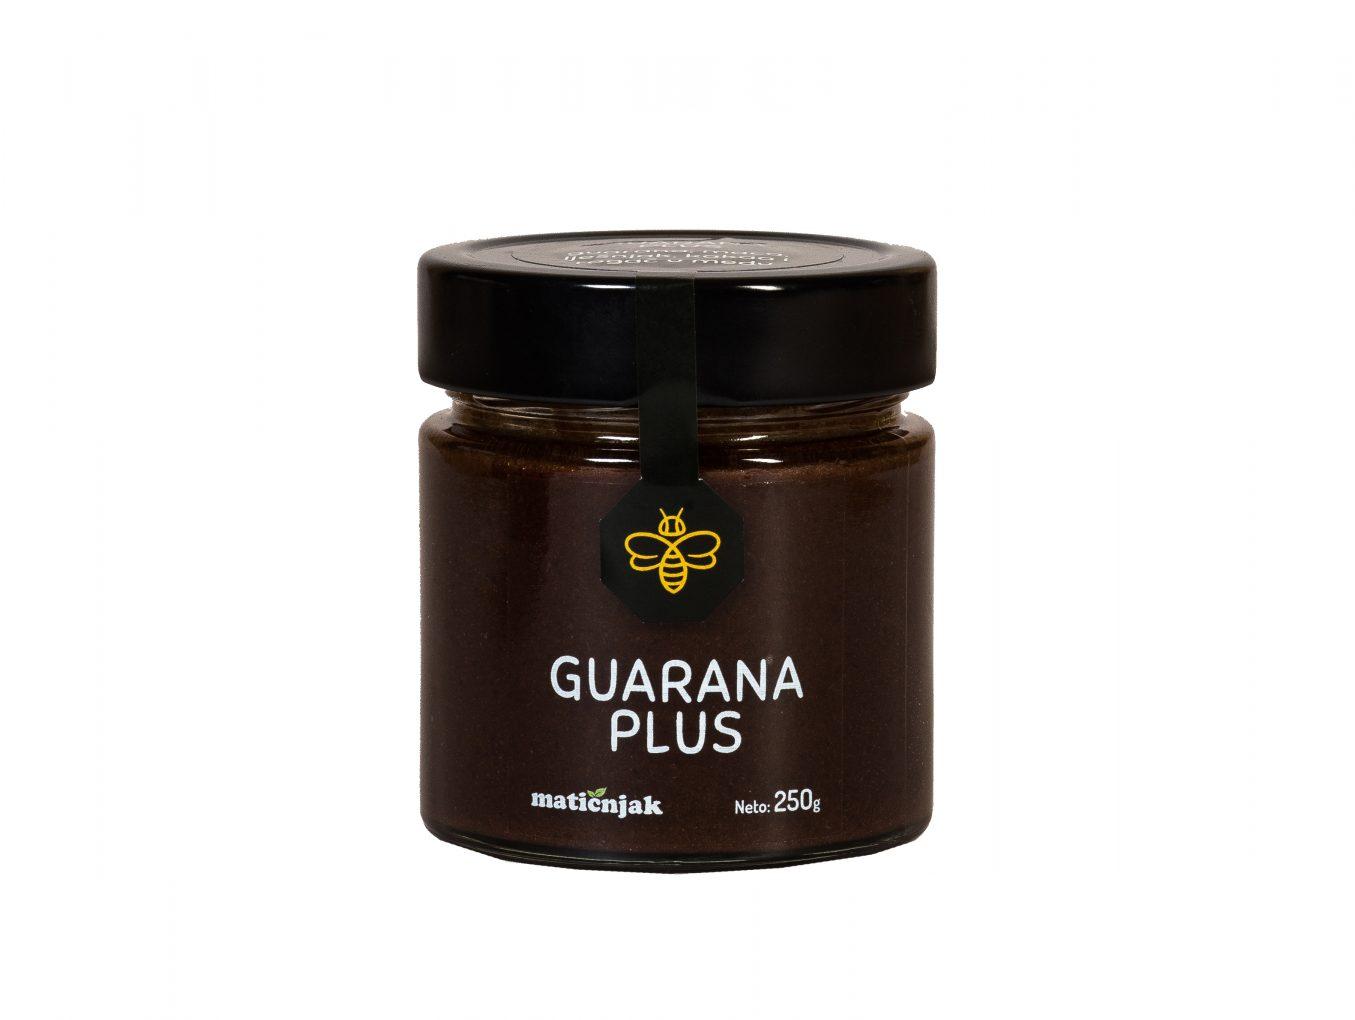 Guarana plus - Dodatak prehrani na bazi meda